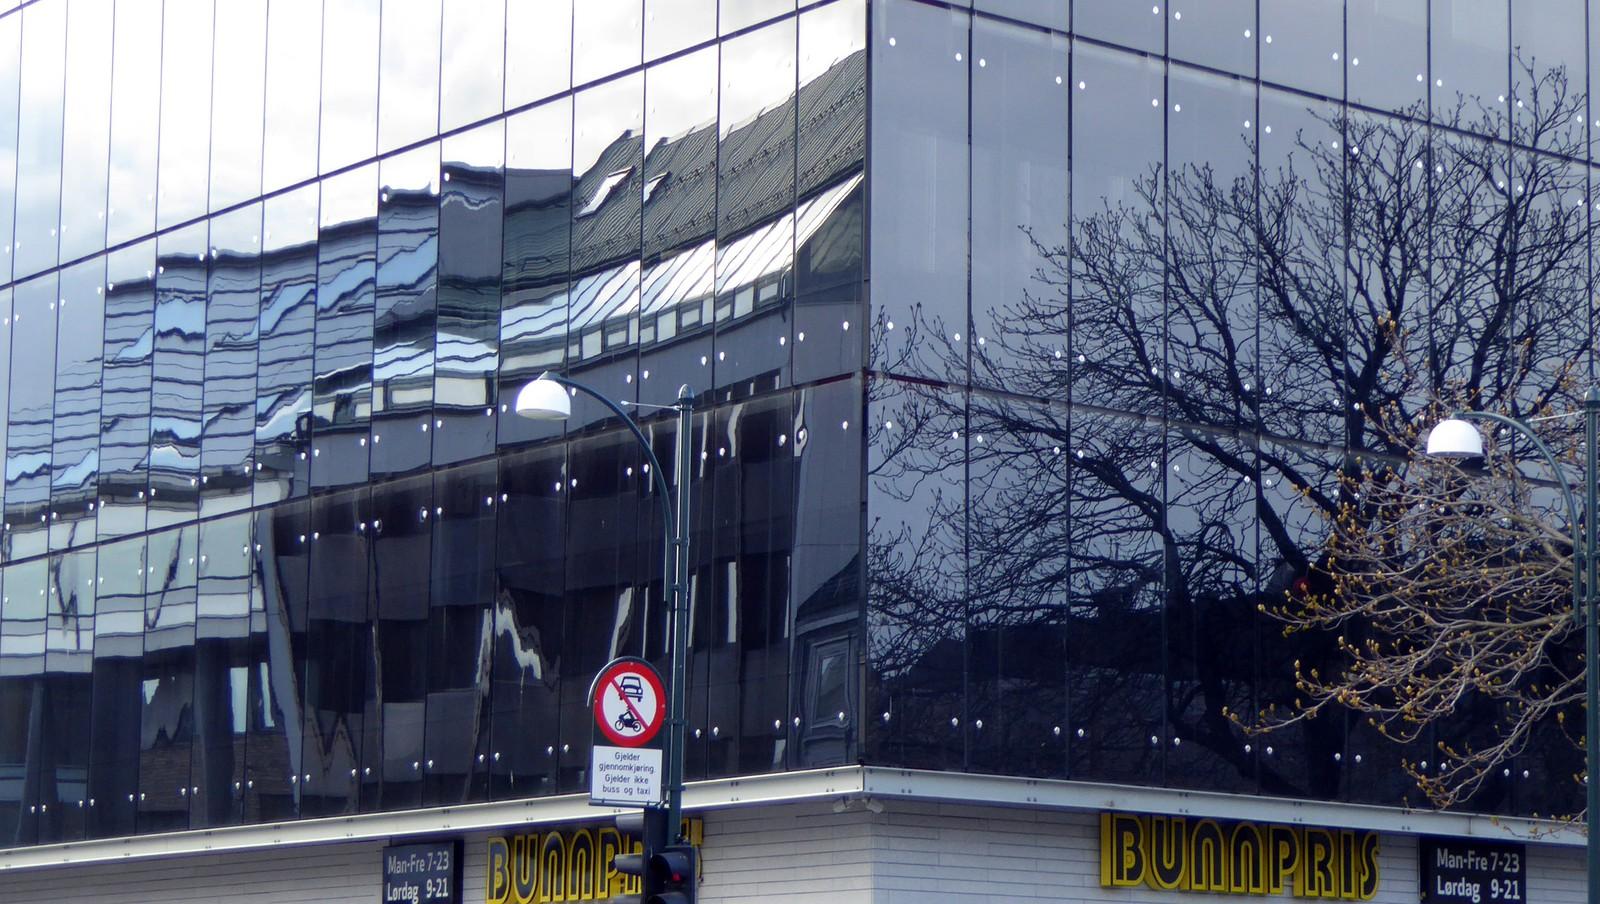 Bunnpris speiler byen